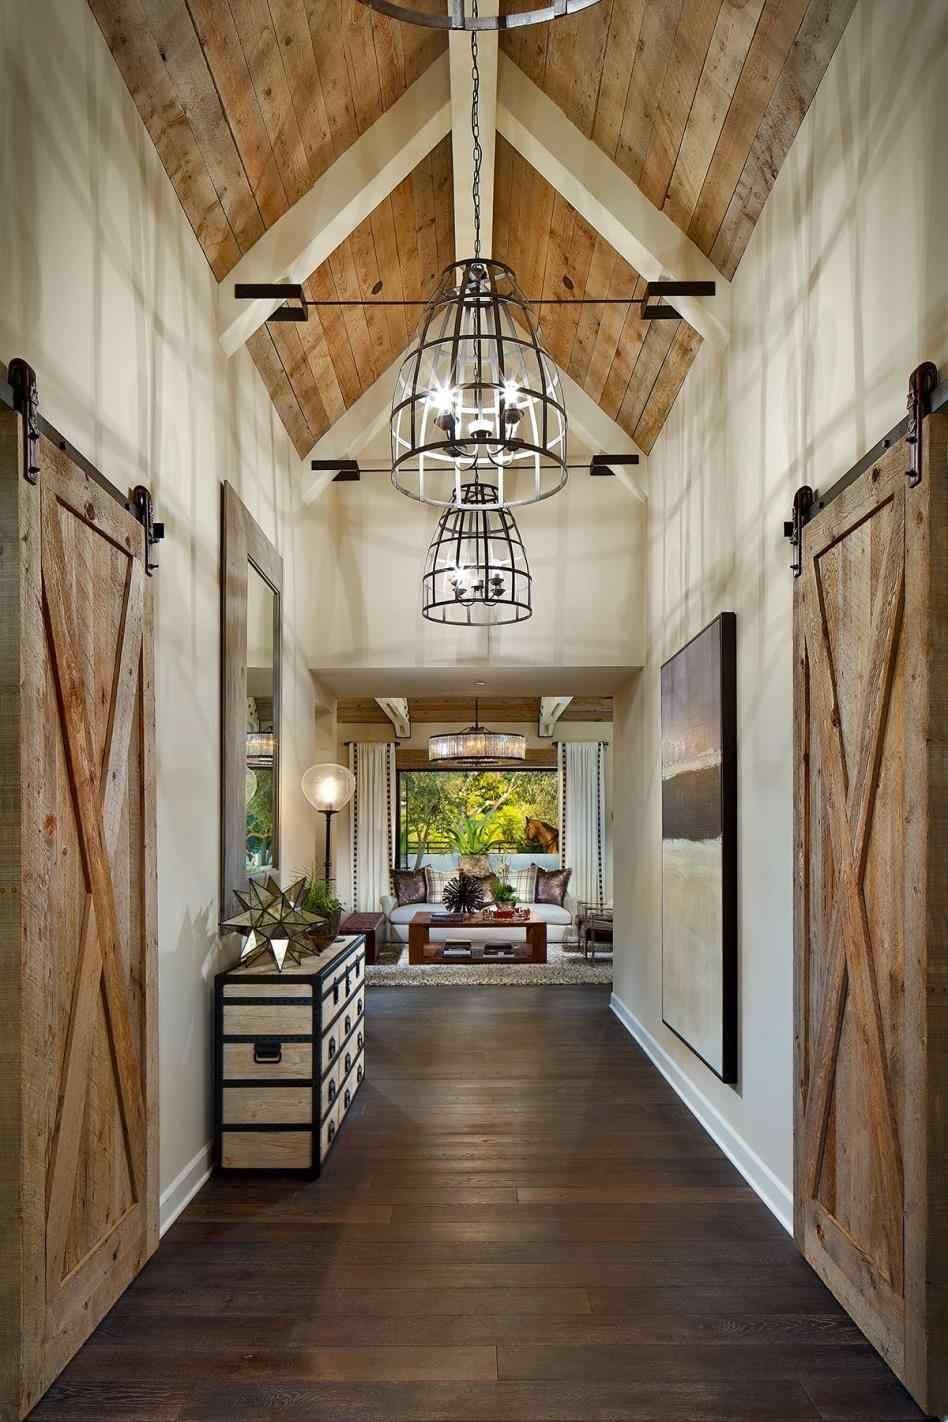 farmhouse interior design ideas has certain characteristics classical elegant and cozy f on kitchen interior farmhouse id=99064